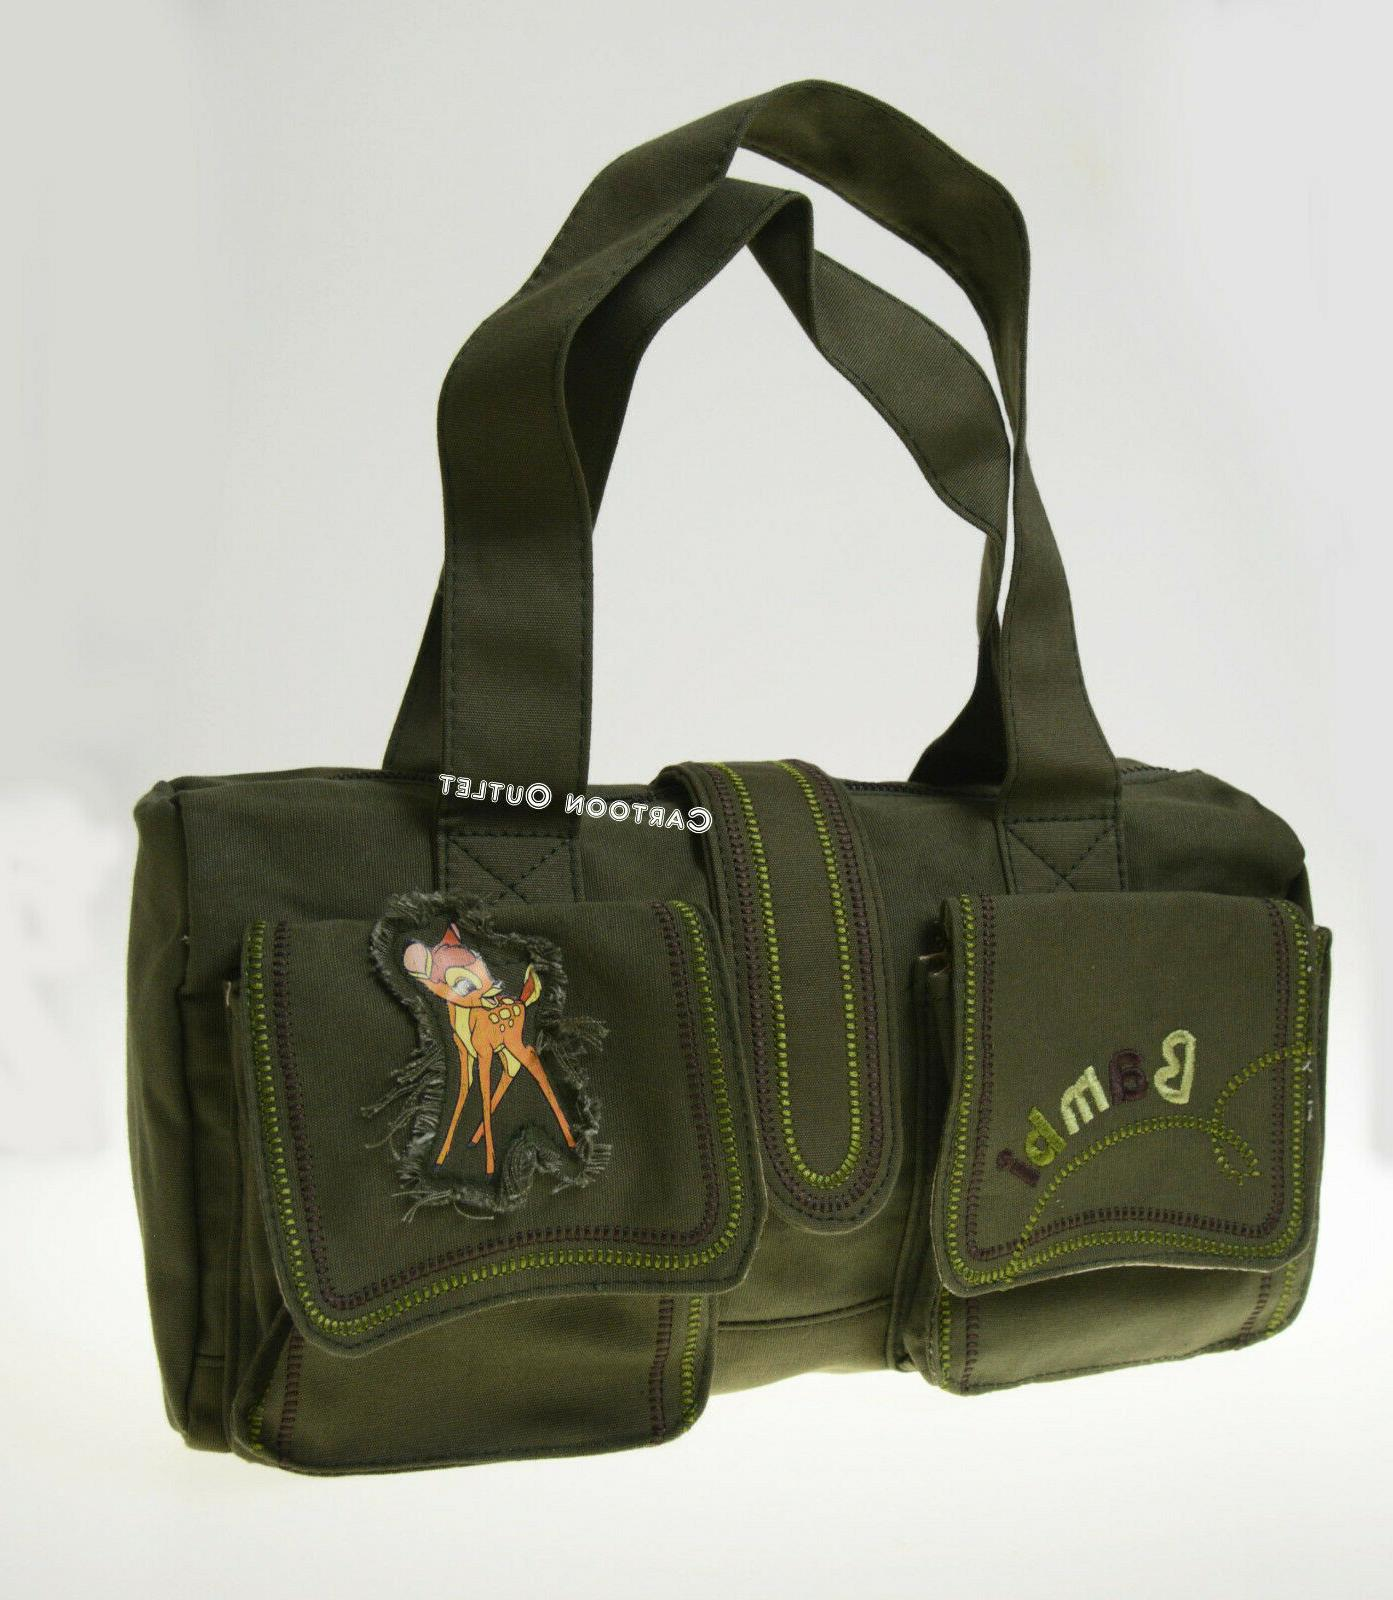 DISNEY PURSE HANDBAG CANVAS GREEN BIRTHDAY GIFT NWT WOMAN Bag